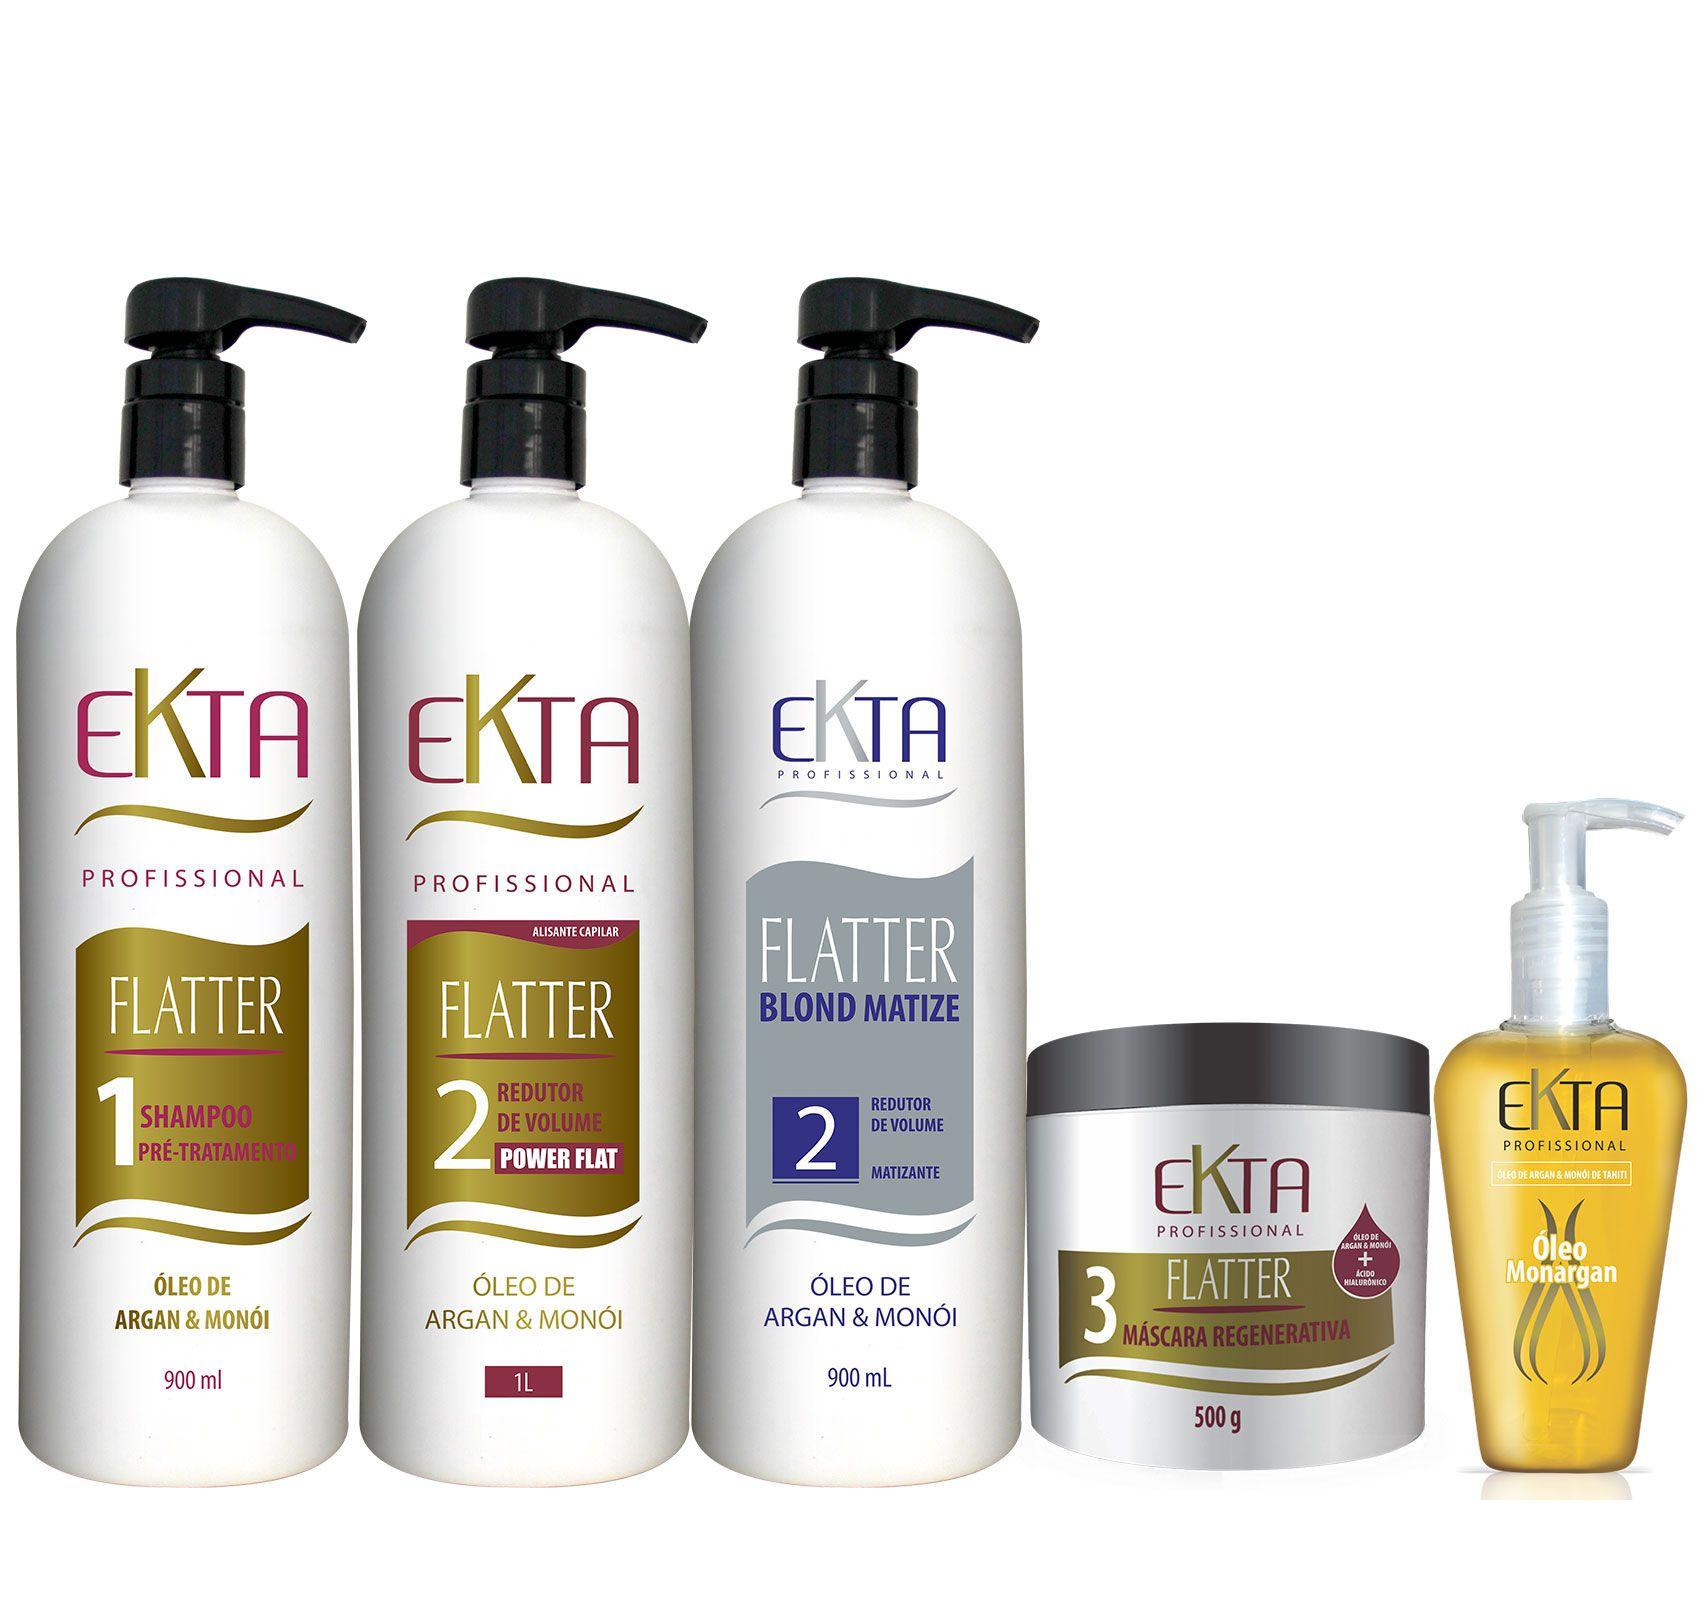 Shampoo Pré-tratamento Flatter 1 - Óleo de Monói & Argan (900mL)